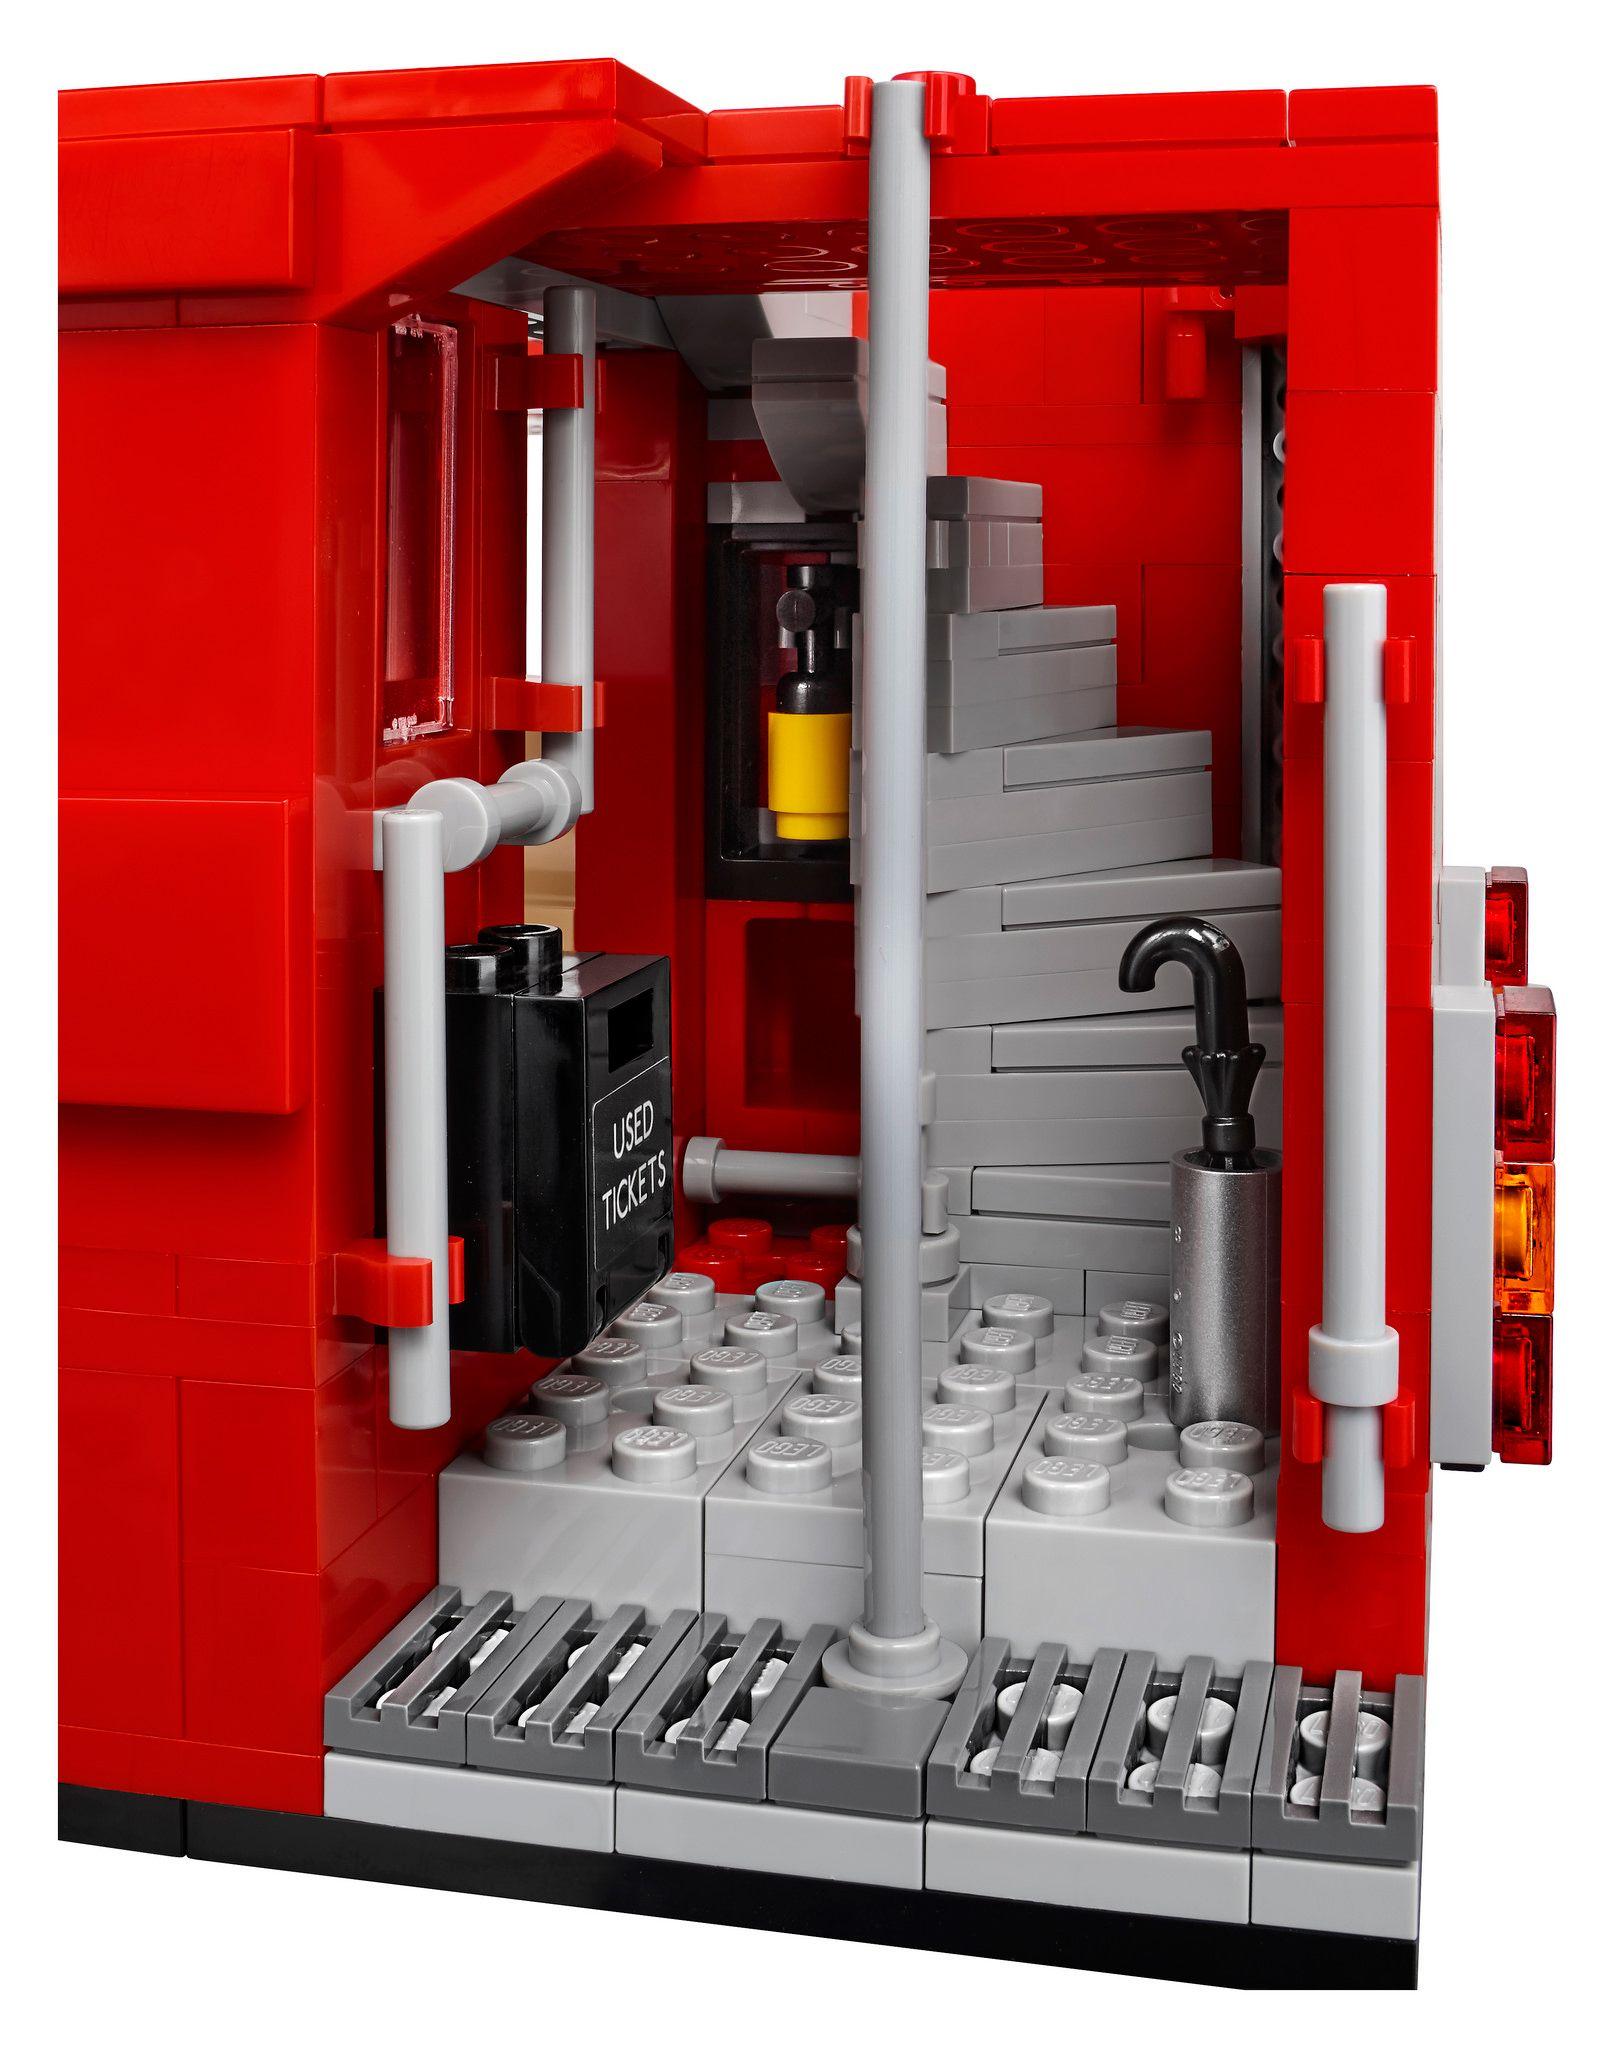 LEGO-London-Bus-10